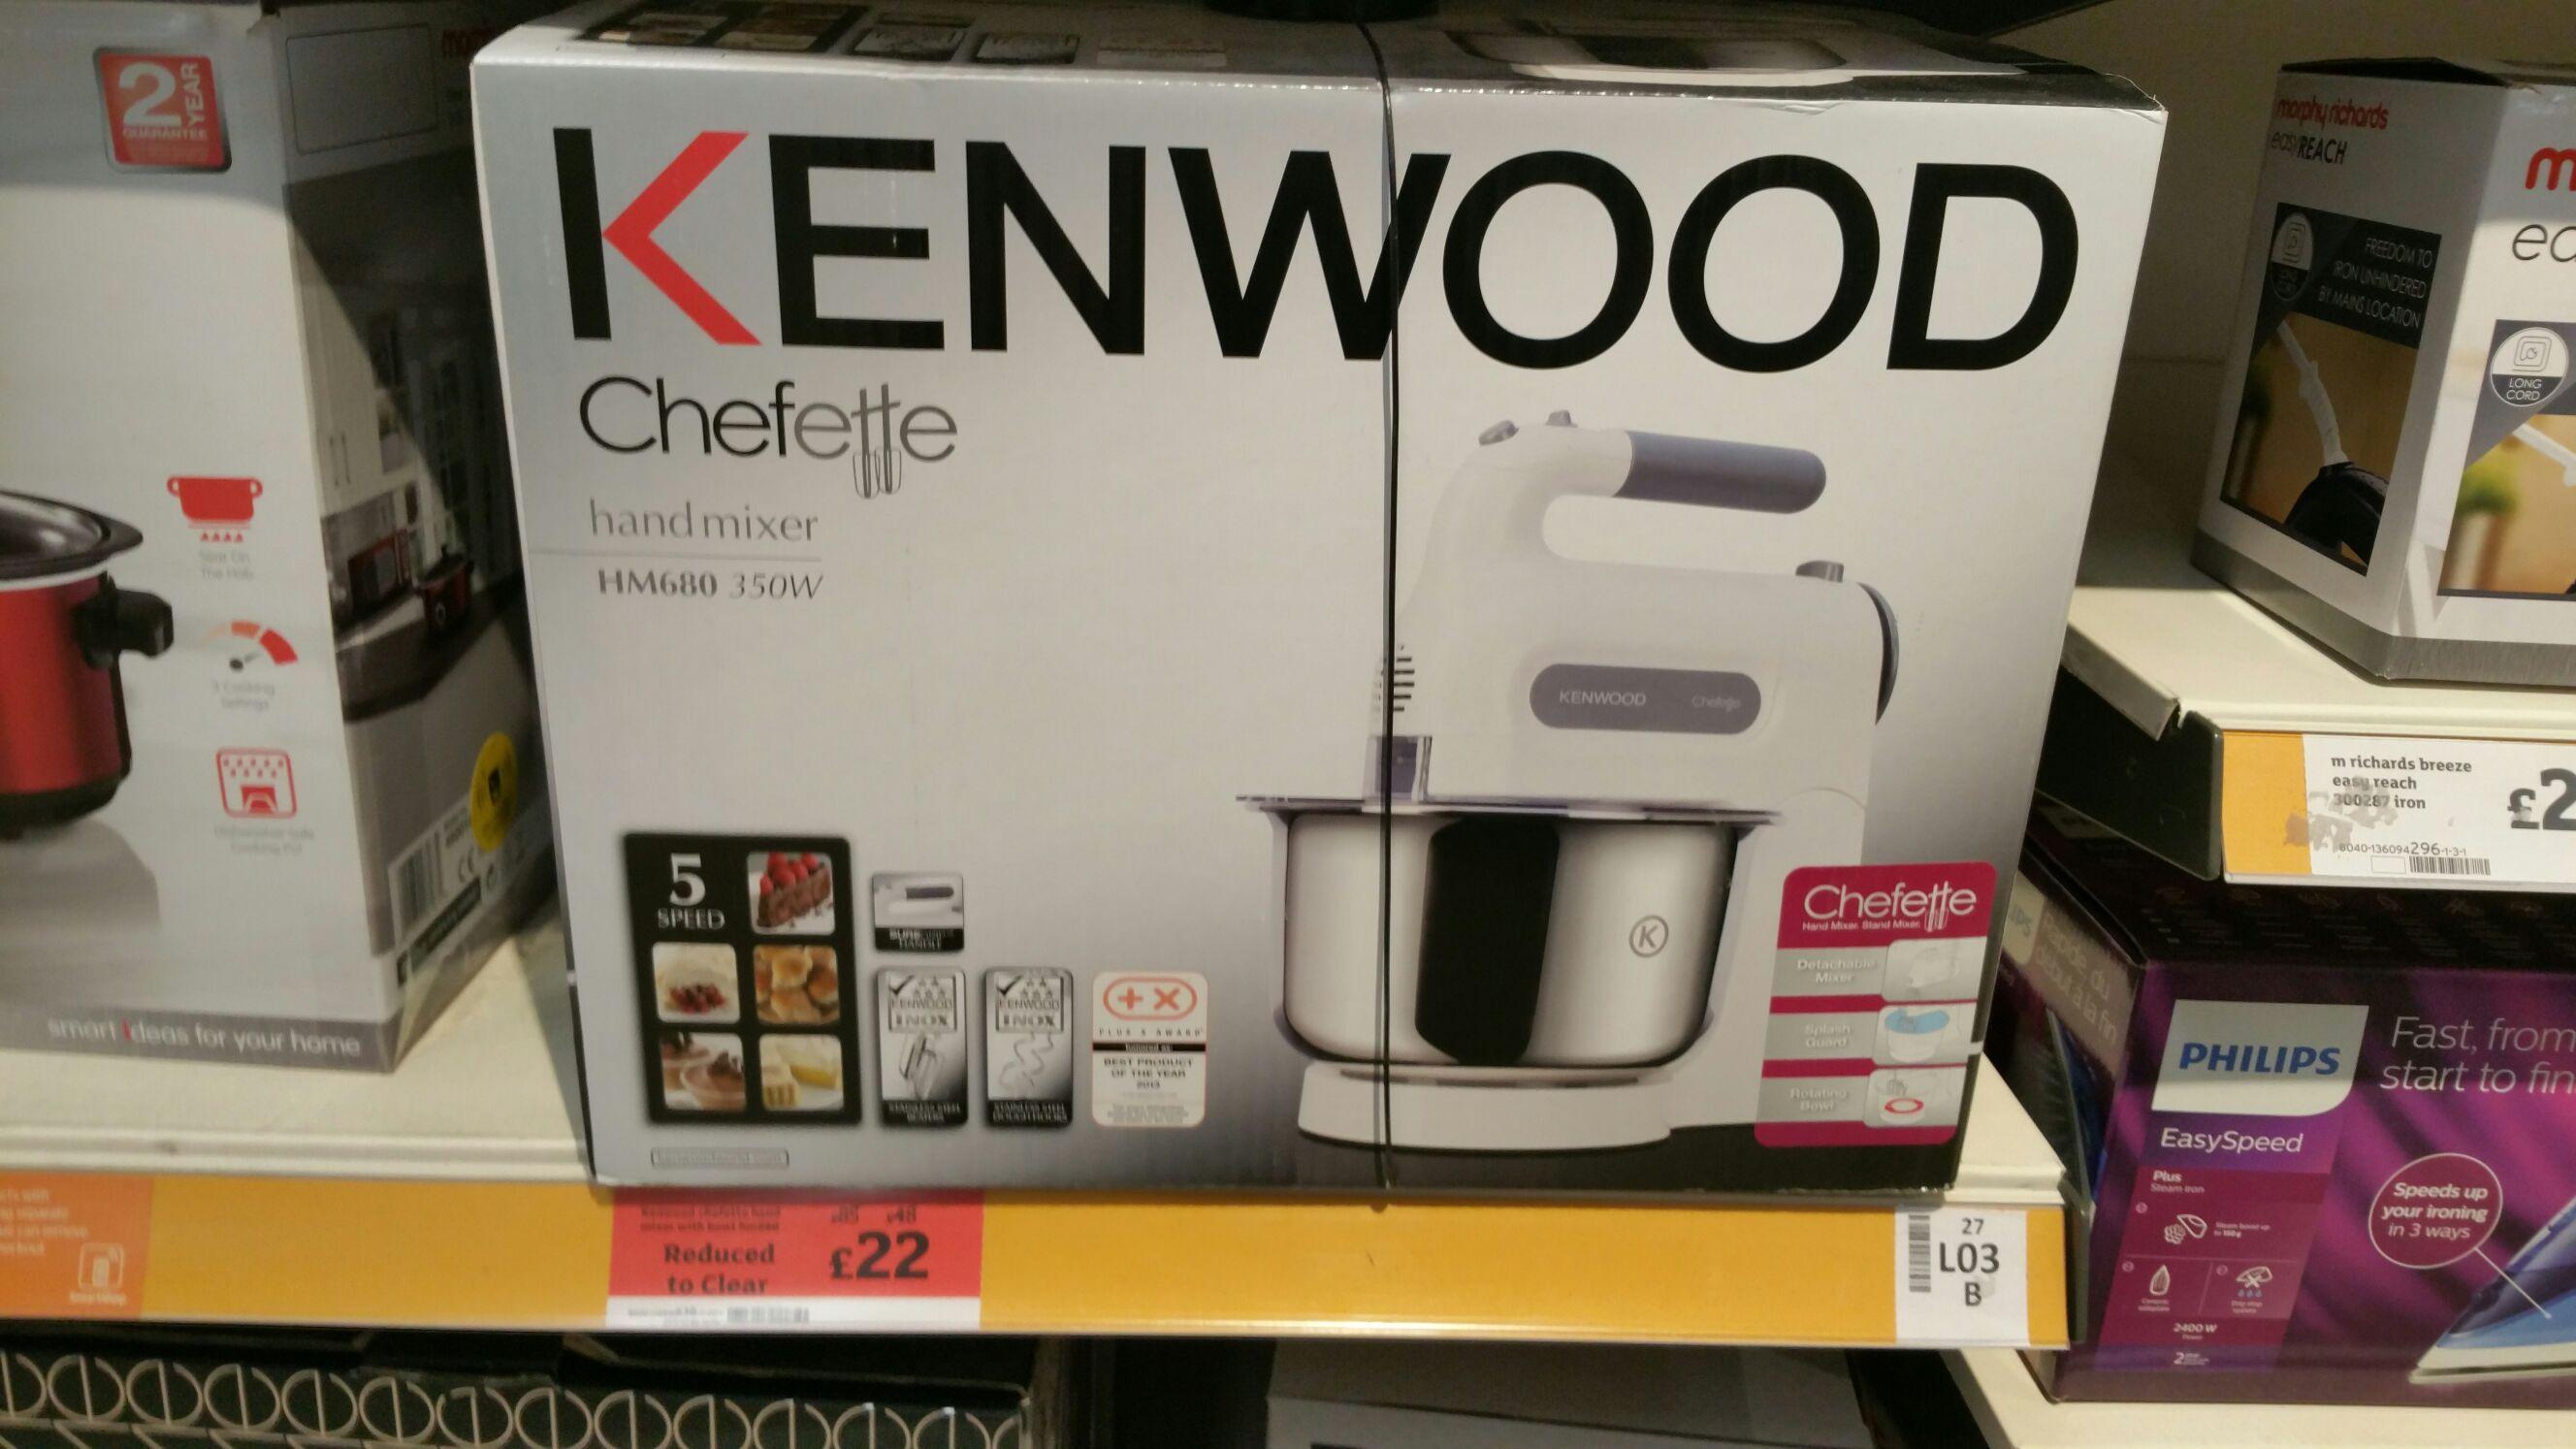 Kenwood Chefette HM680 Hand Mixer with Bowl - White £22 @ Sainsburys (Middlesbrough)